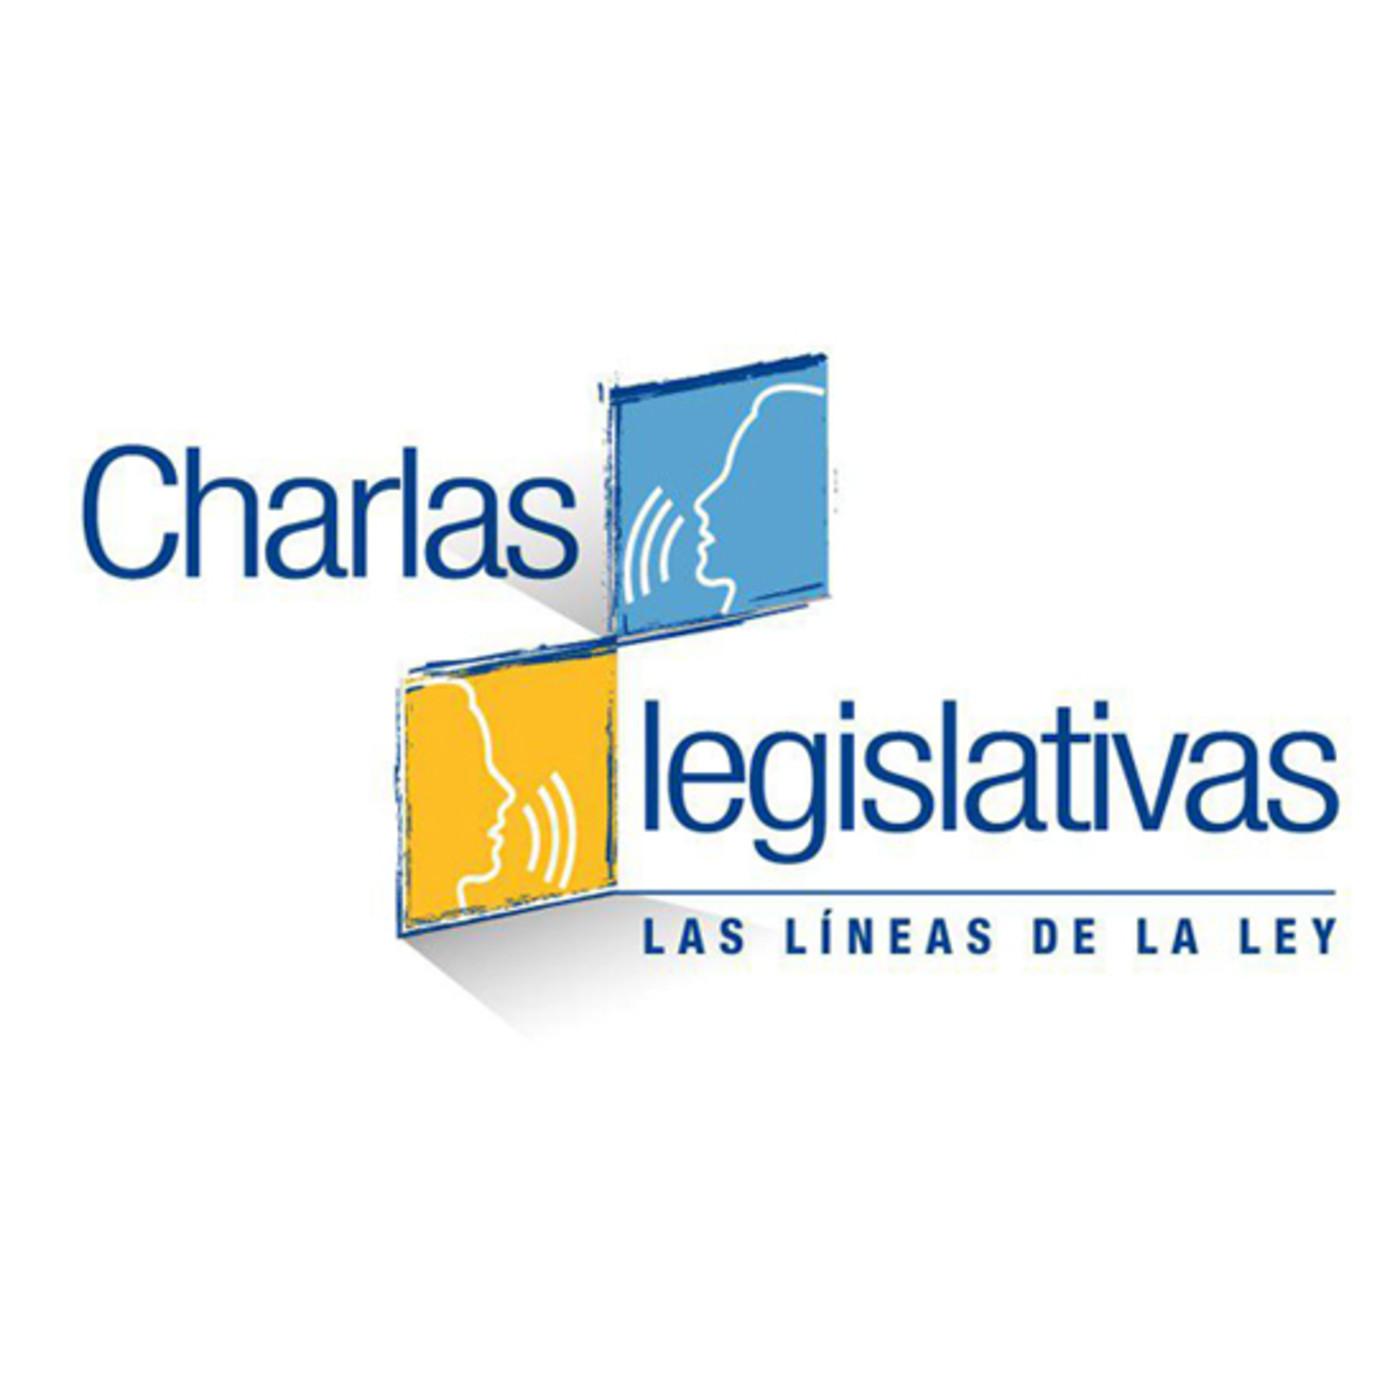 Charlas legislativas: las líneas de la ley